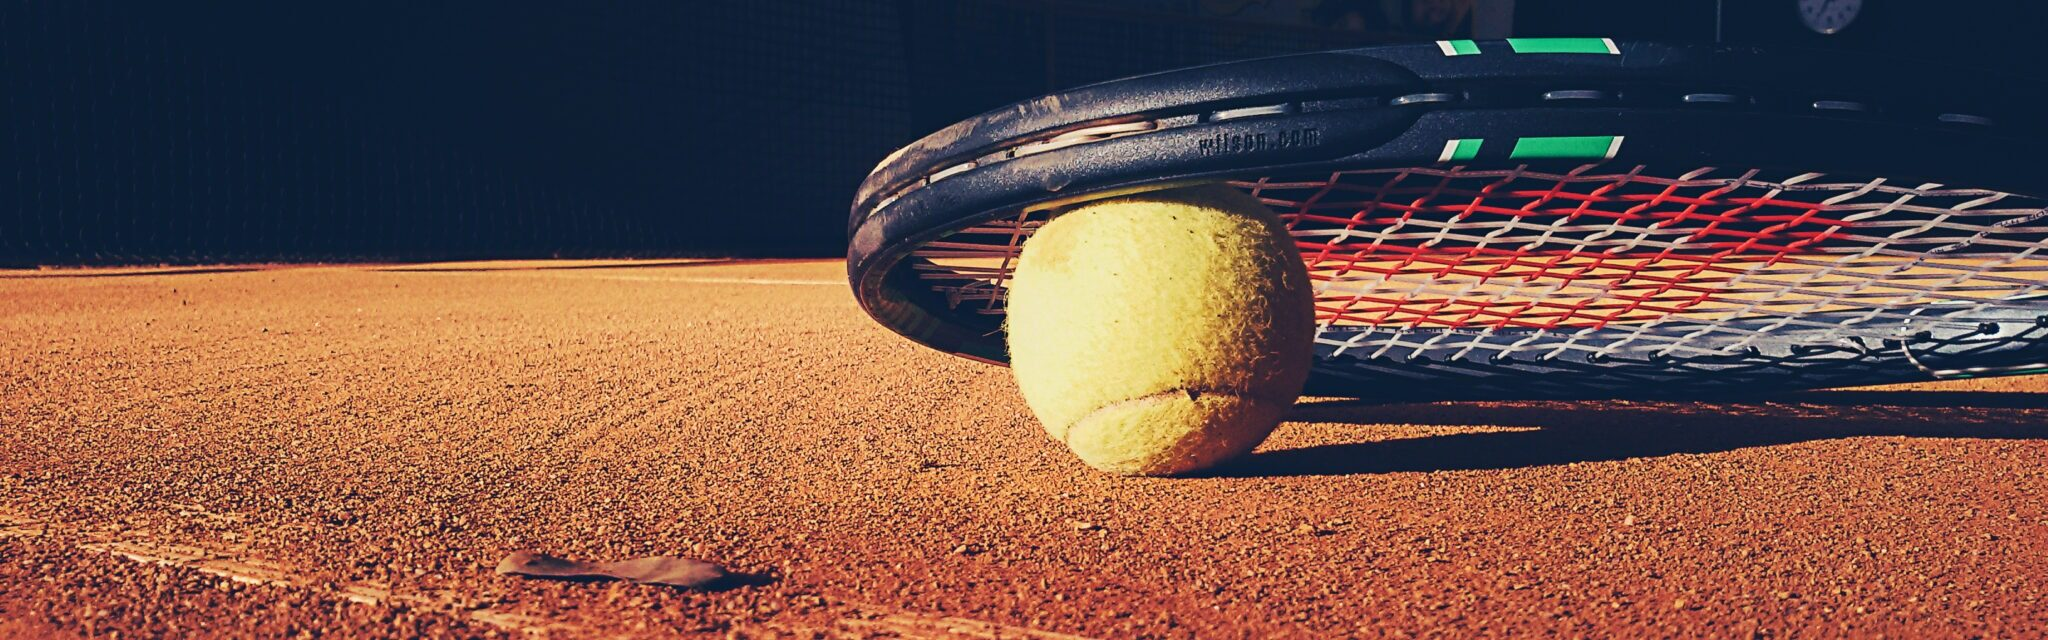 Boka tennisbanan online